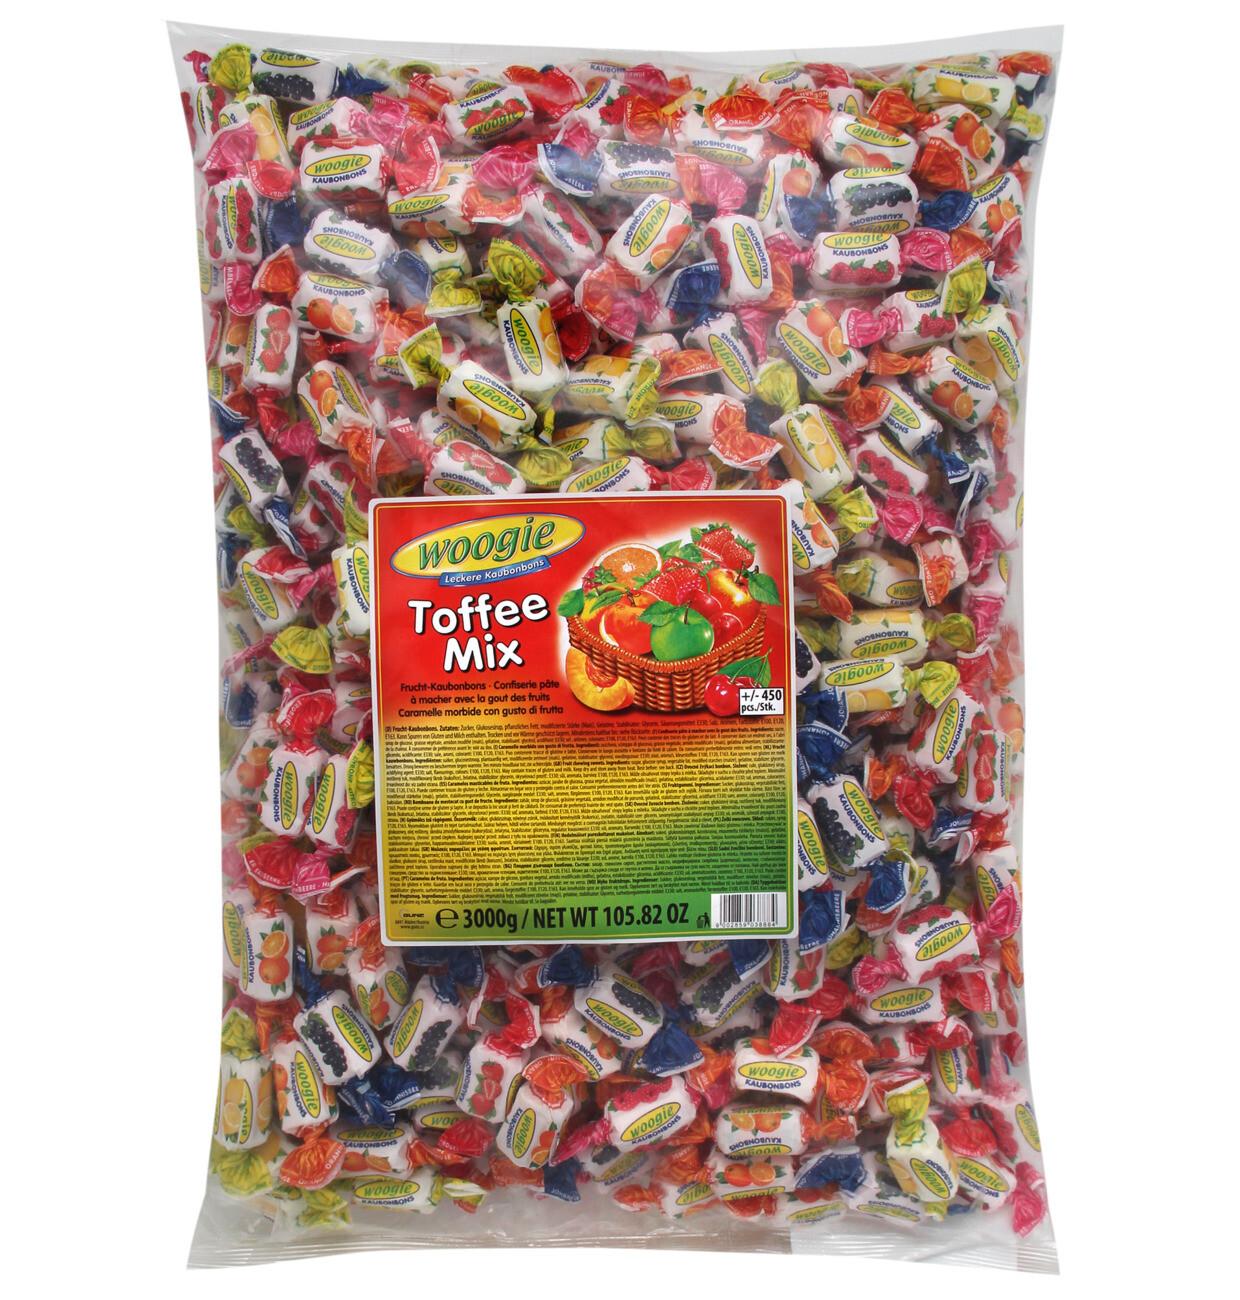 Outlet: Woogie Bonbons Toffee Mix 3kg